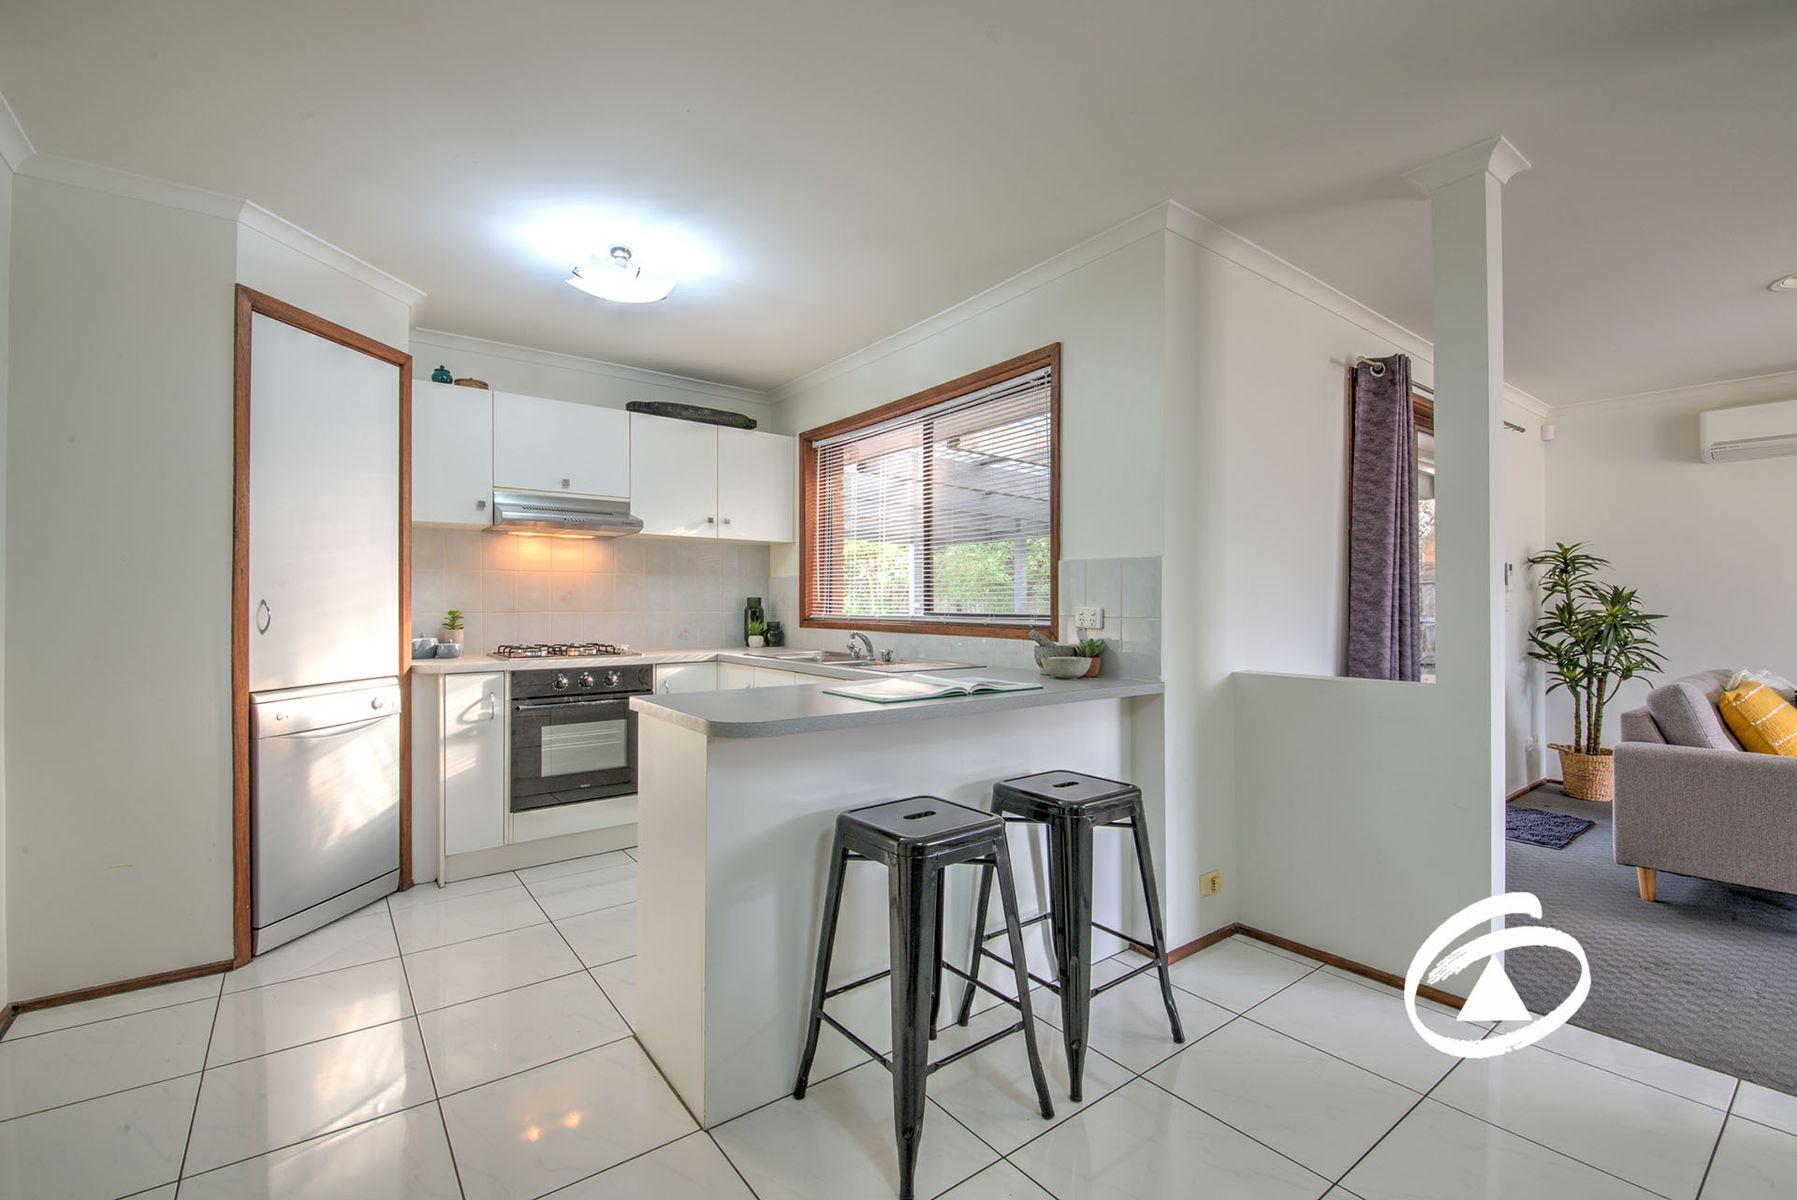 29 Coolong Avenue, Berwick, VIC 3806